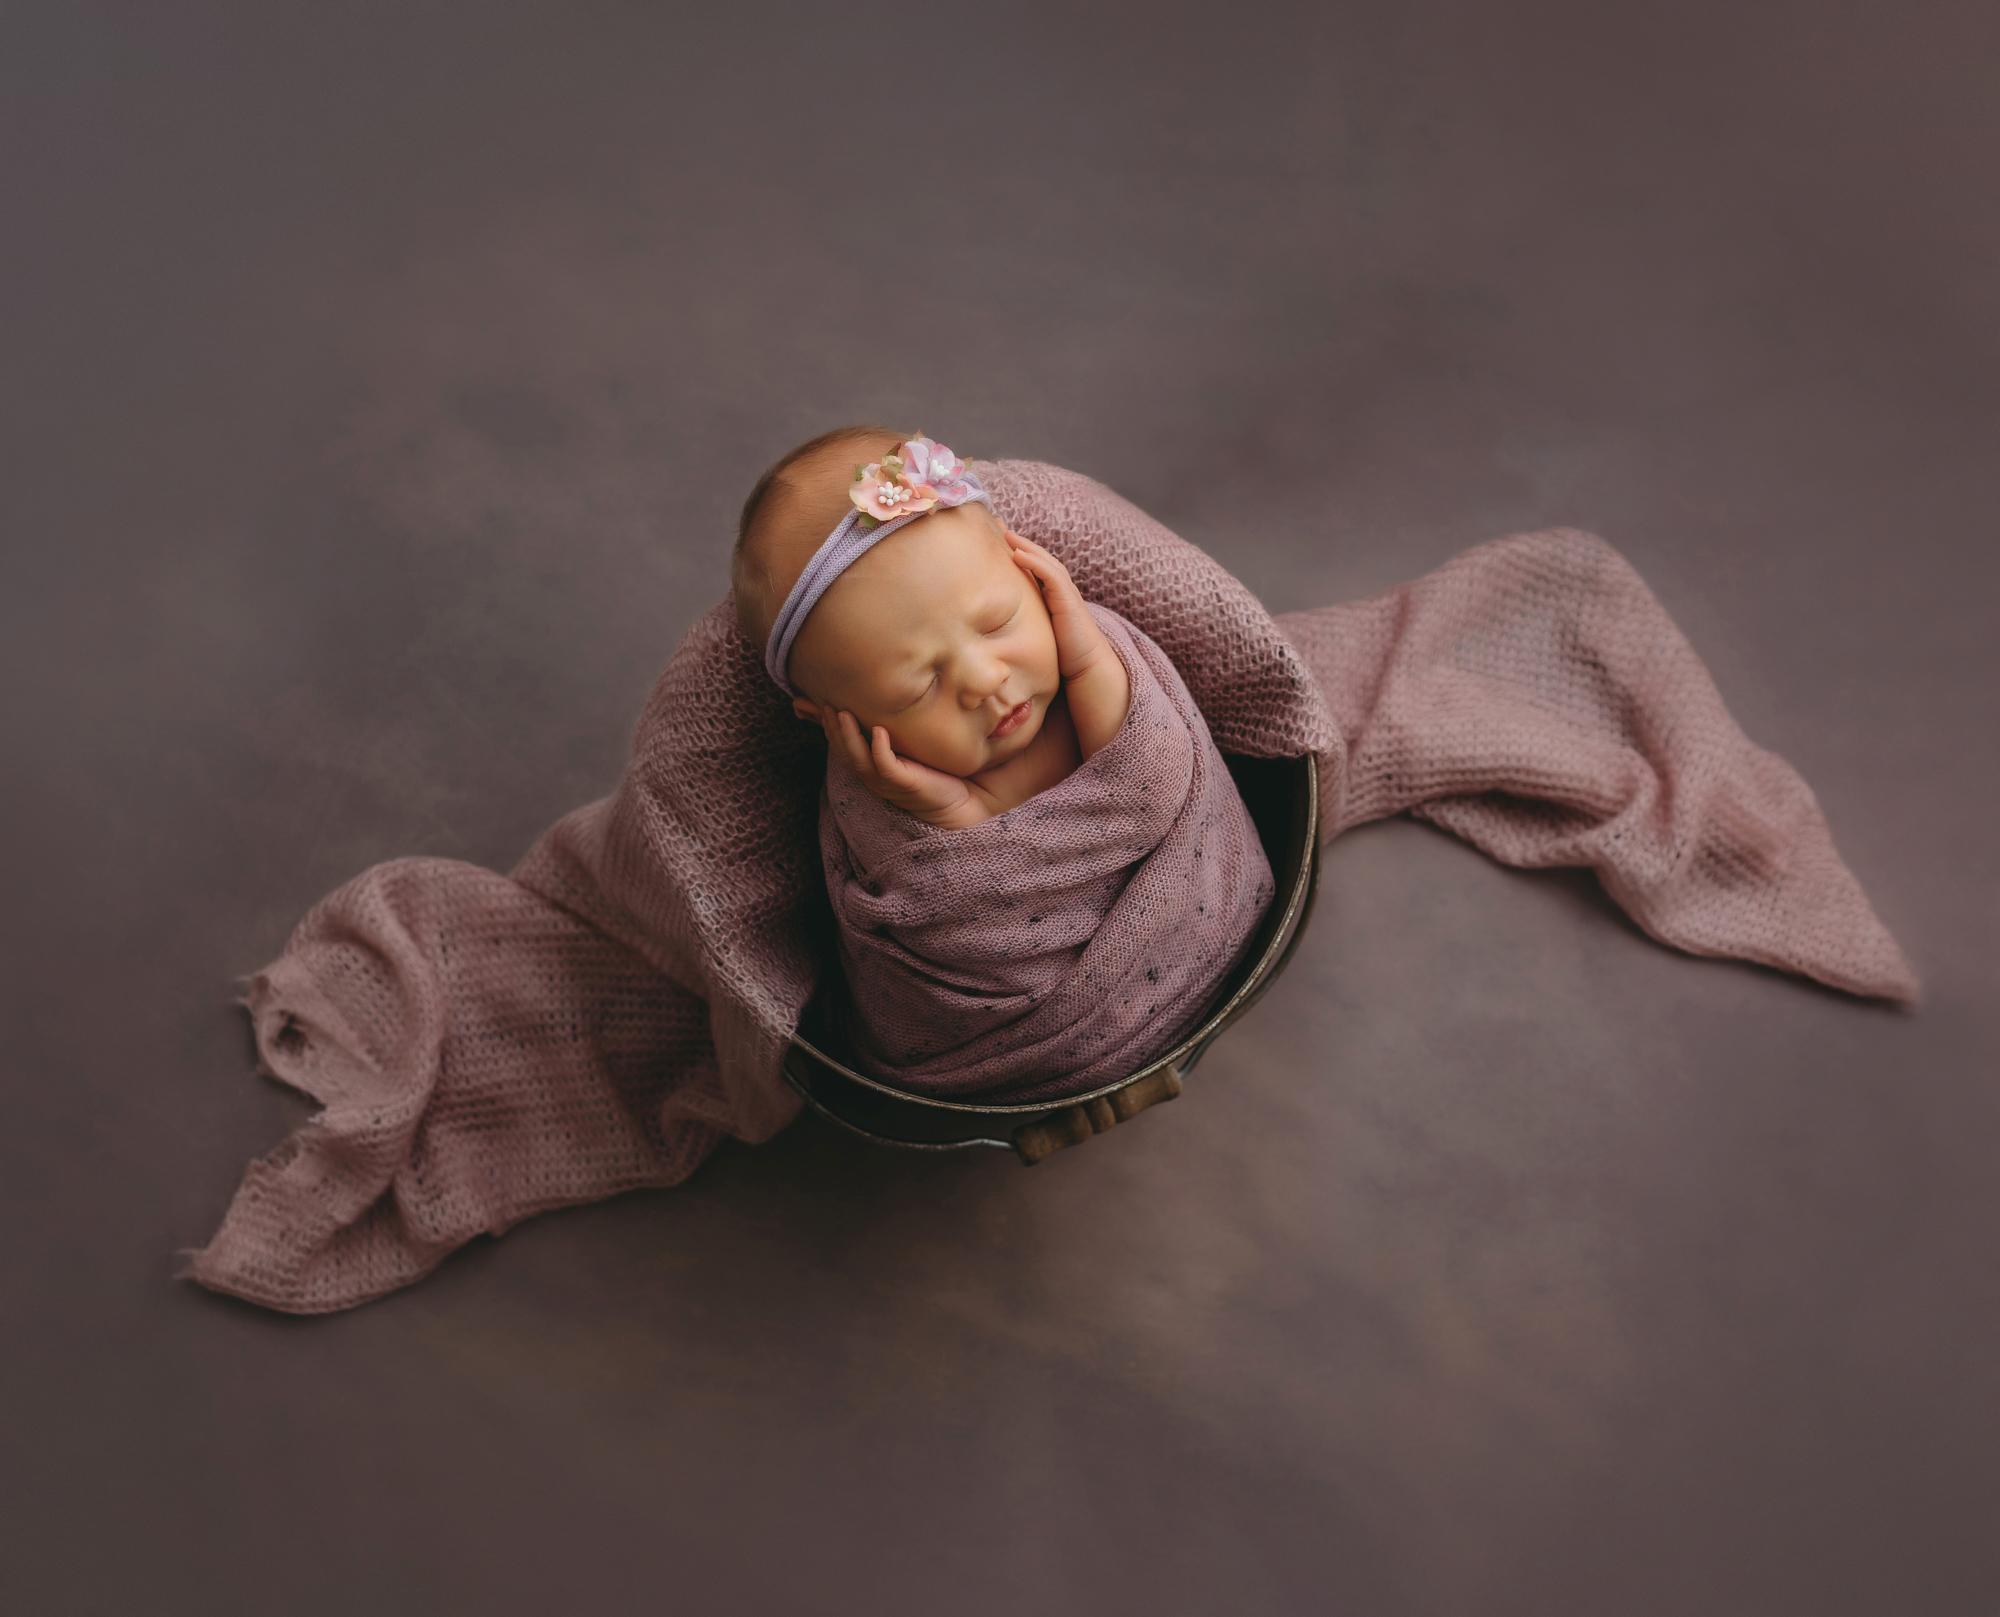 Newborn portrait of baby in pink wrap and bucket